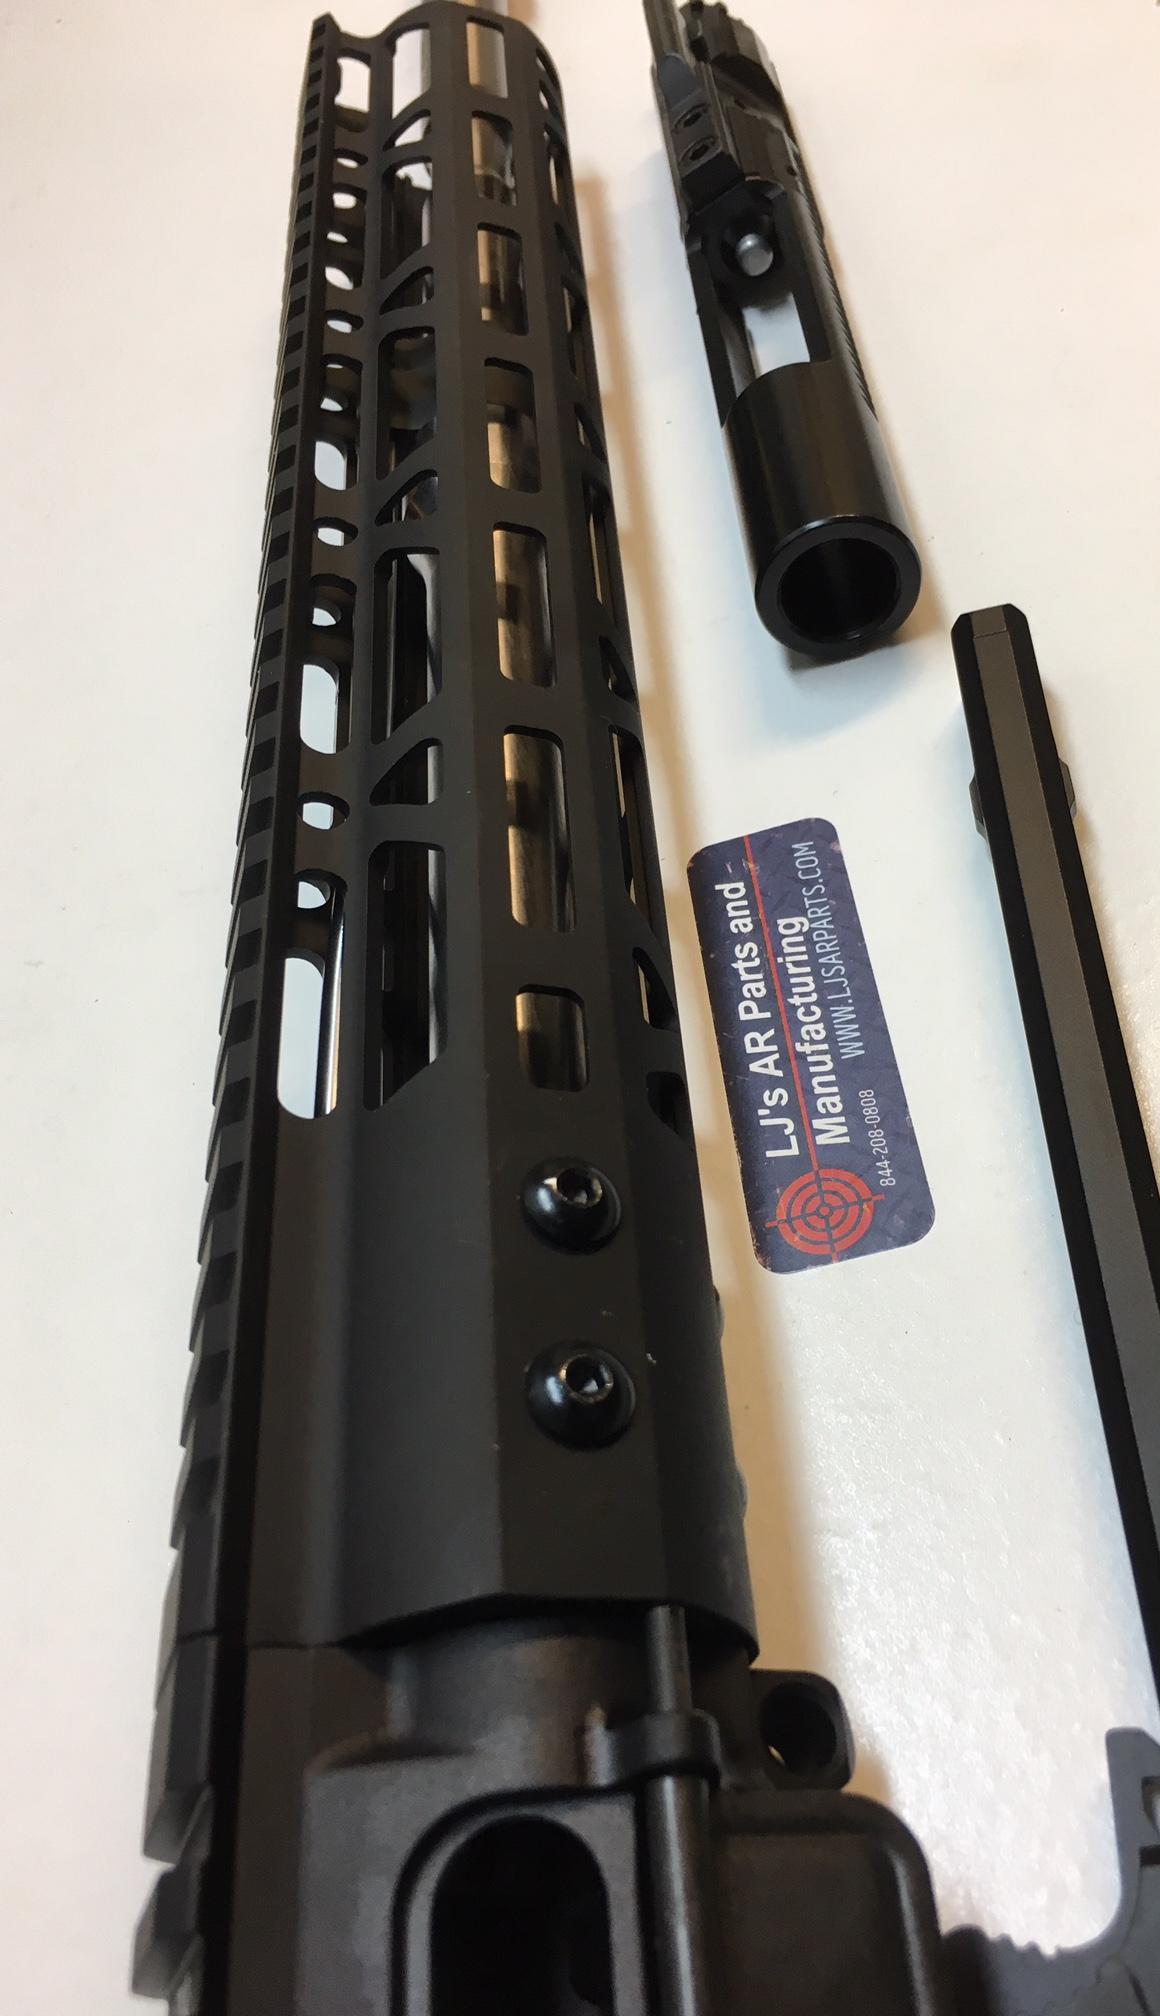 LJ's AR15 -Billet 16 inch Stainless steel Complete upper receiver in 6 5  Grendel